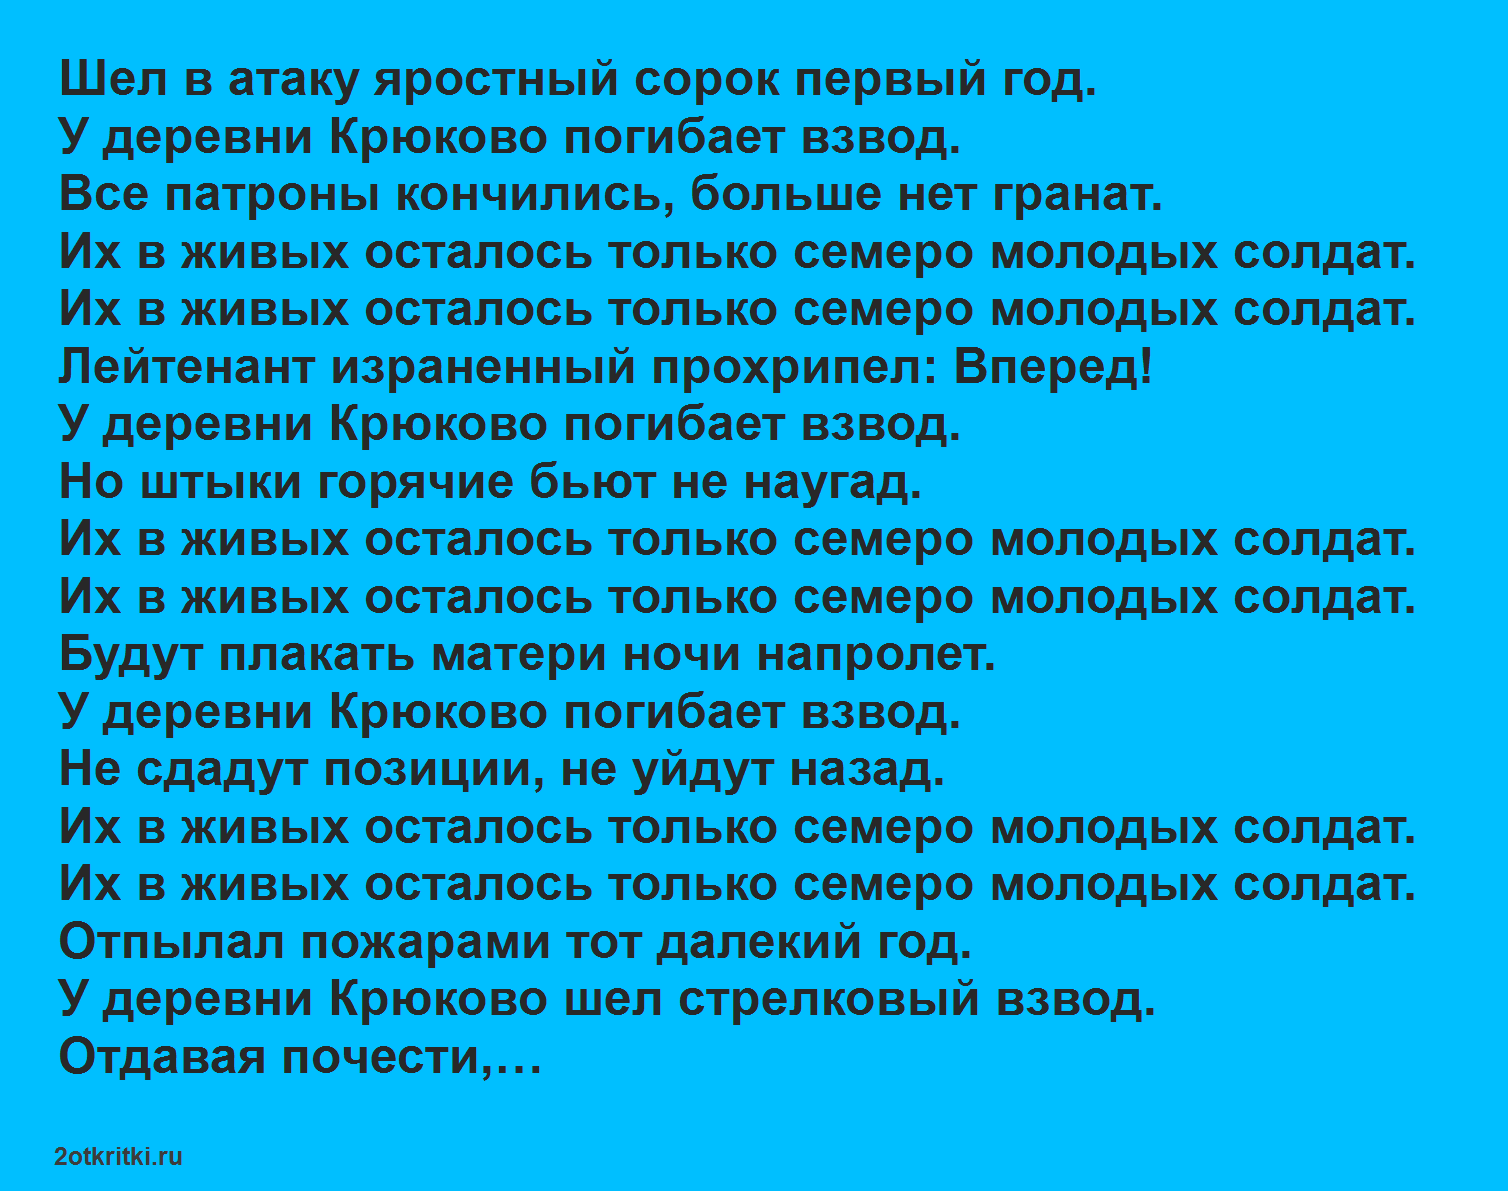 Песня на 23 февраля для детей - У деревни Крюково